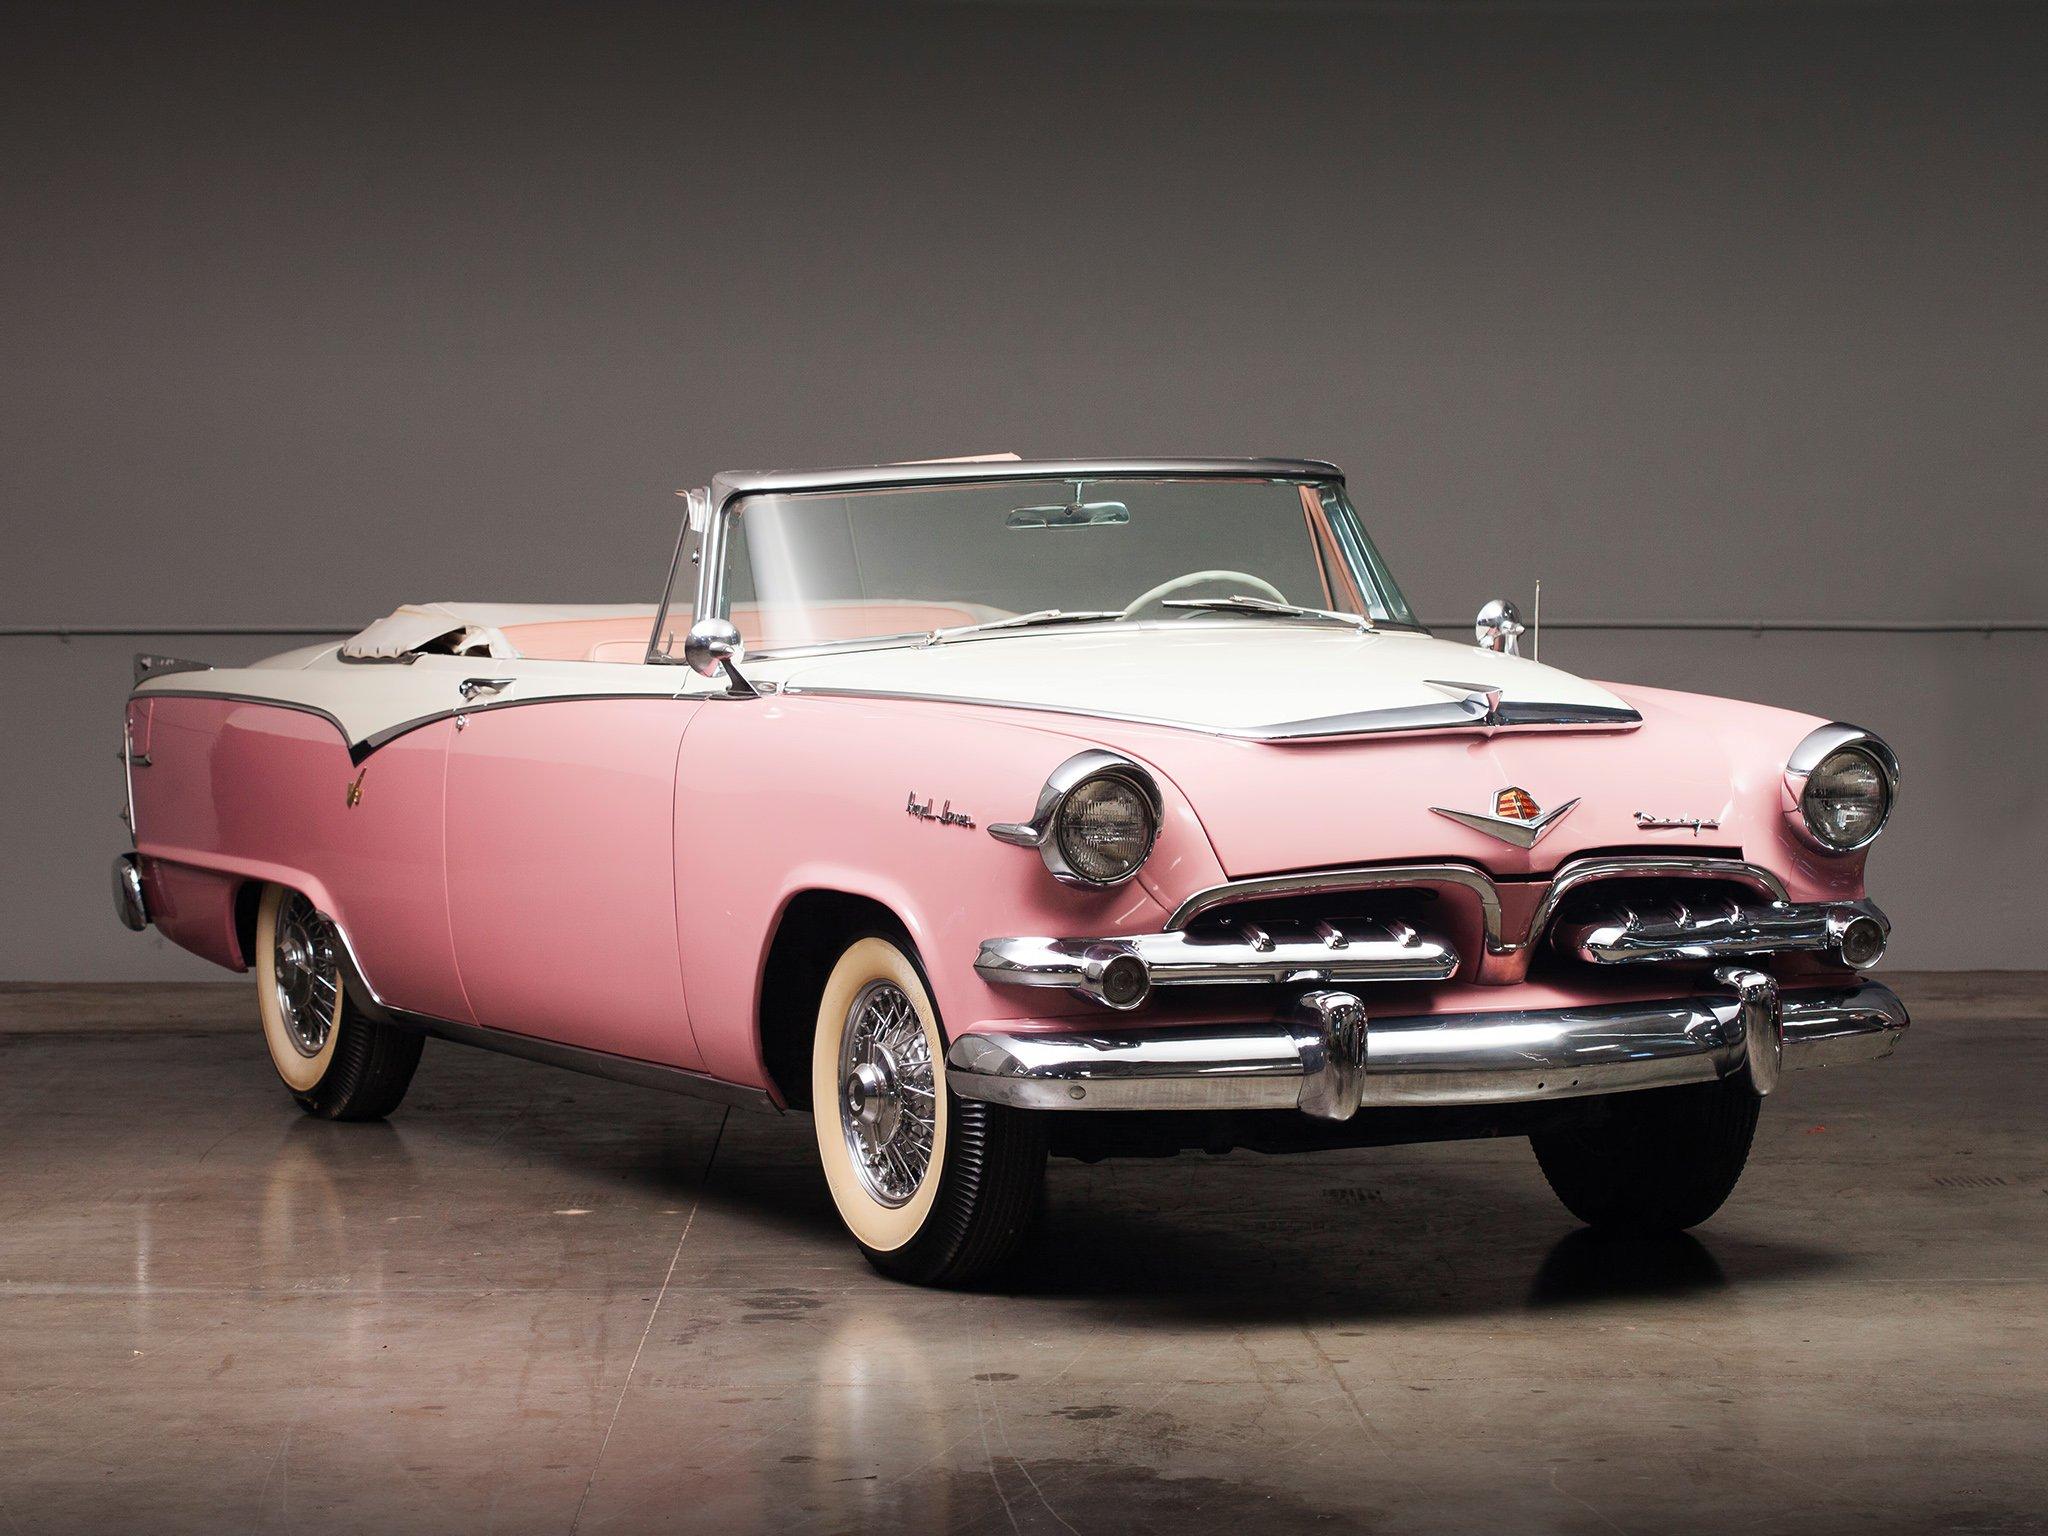 1955 dodge royal lancer convertible cream black fvr cars - Filename 2e94044fa4a02fb63a22309eb4d2ce0a Jpg